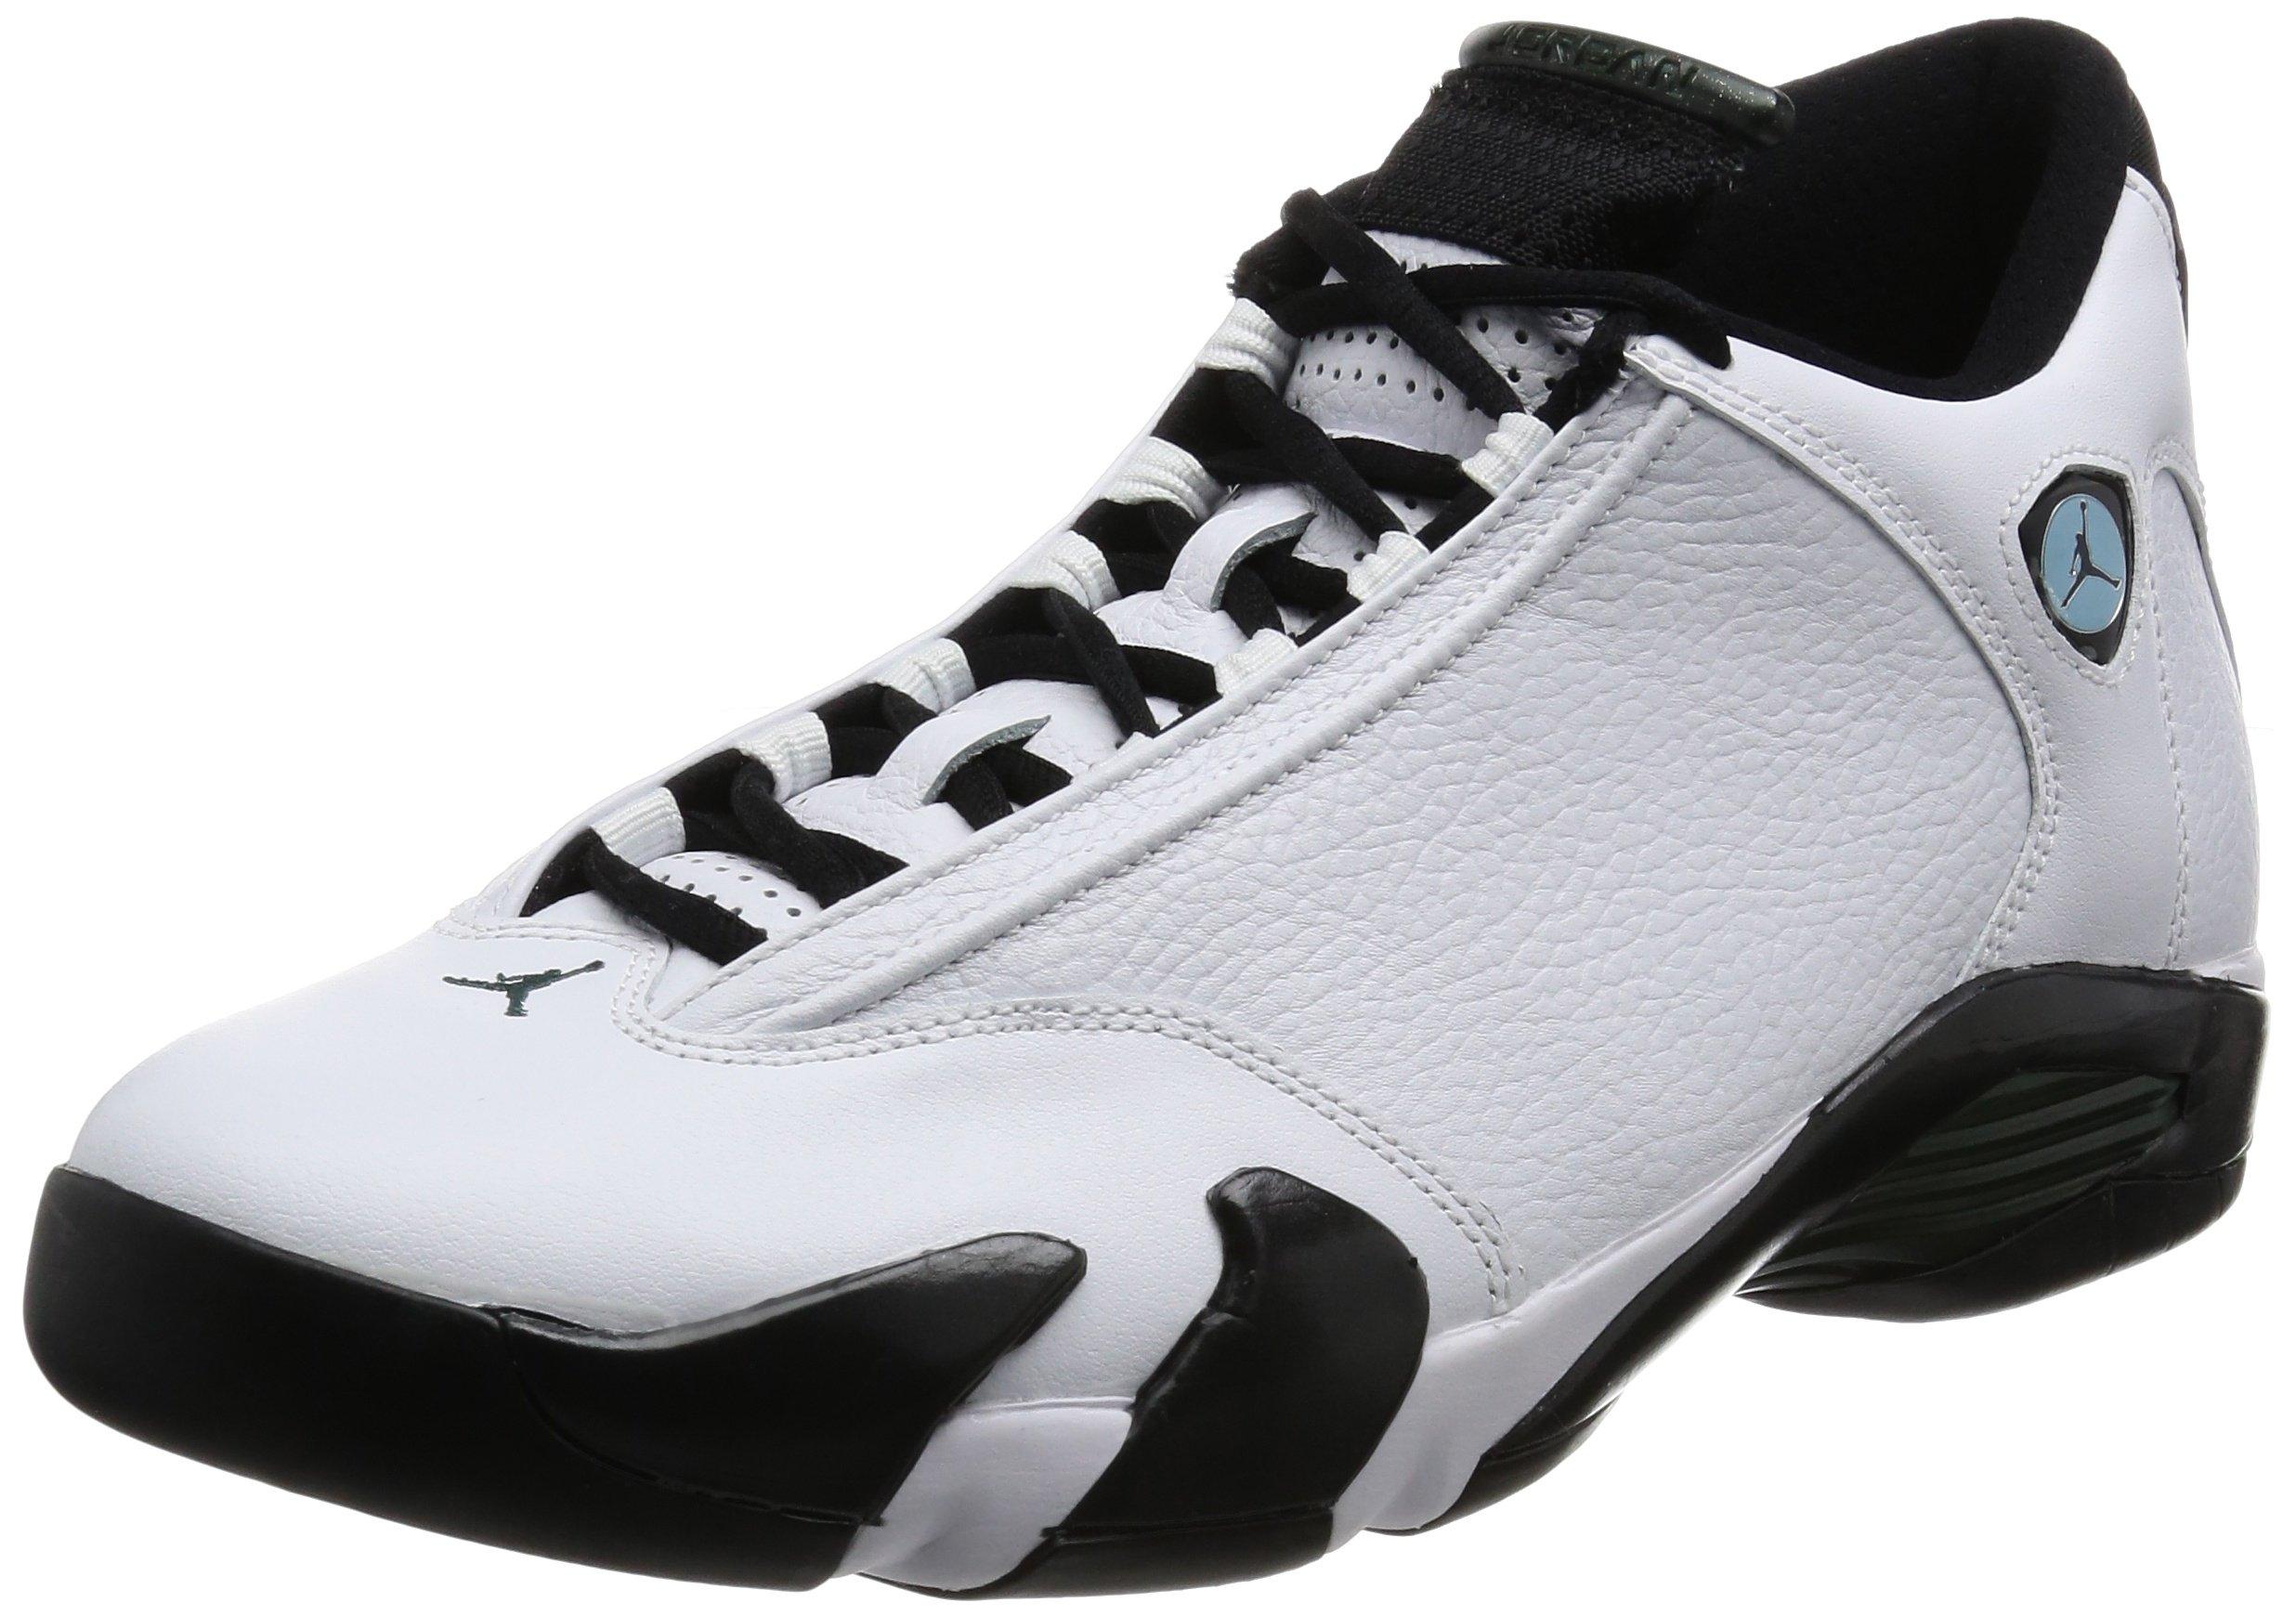 Air Jordan 14 Retro Mens Shoes White/Black/Green/Legend Blue 487471-106 (10 D(M) US) by Nike